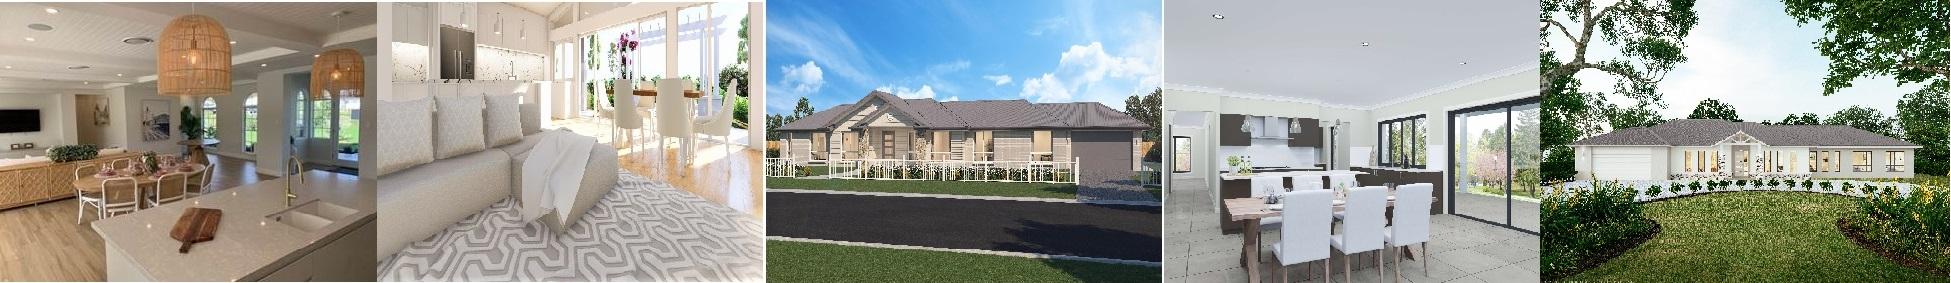 The Mahoney's Pocket North display village opens 13 February 2021